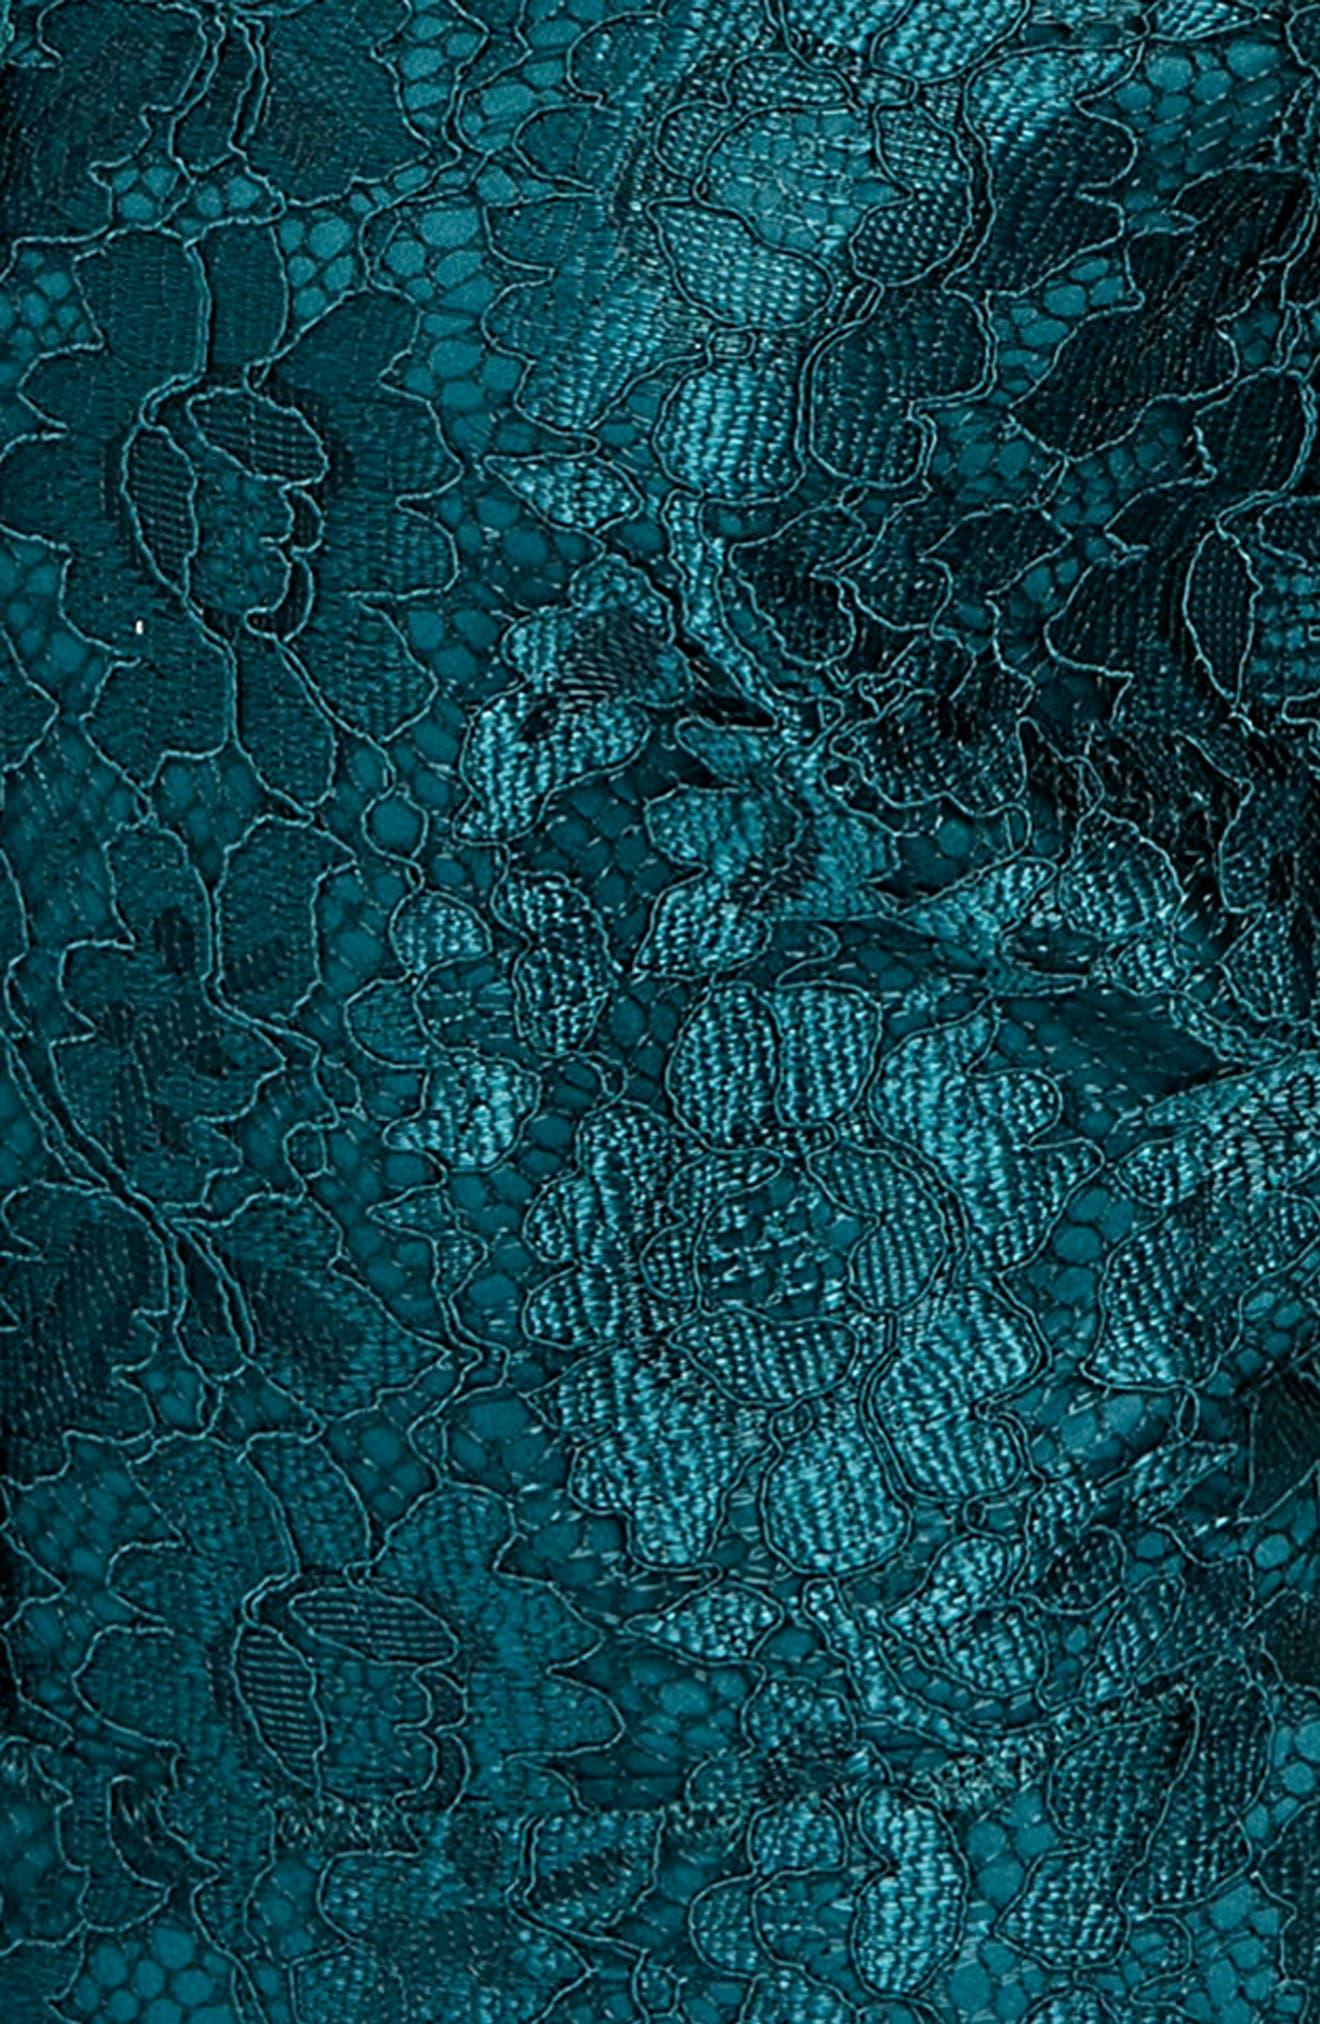 Lace & Lattice Fit & Flare Dress,                             Alternate thumbnail 3, color,                             Teal